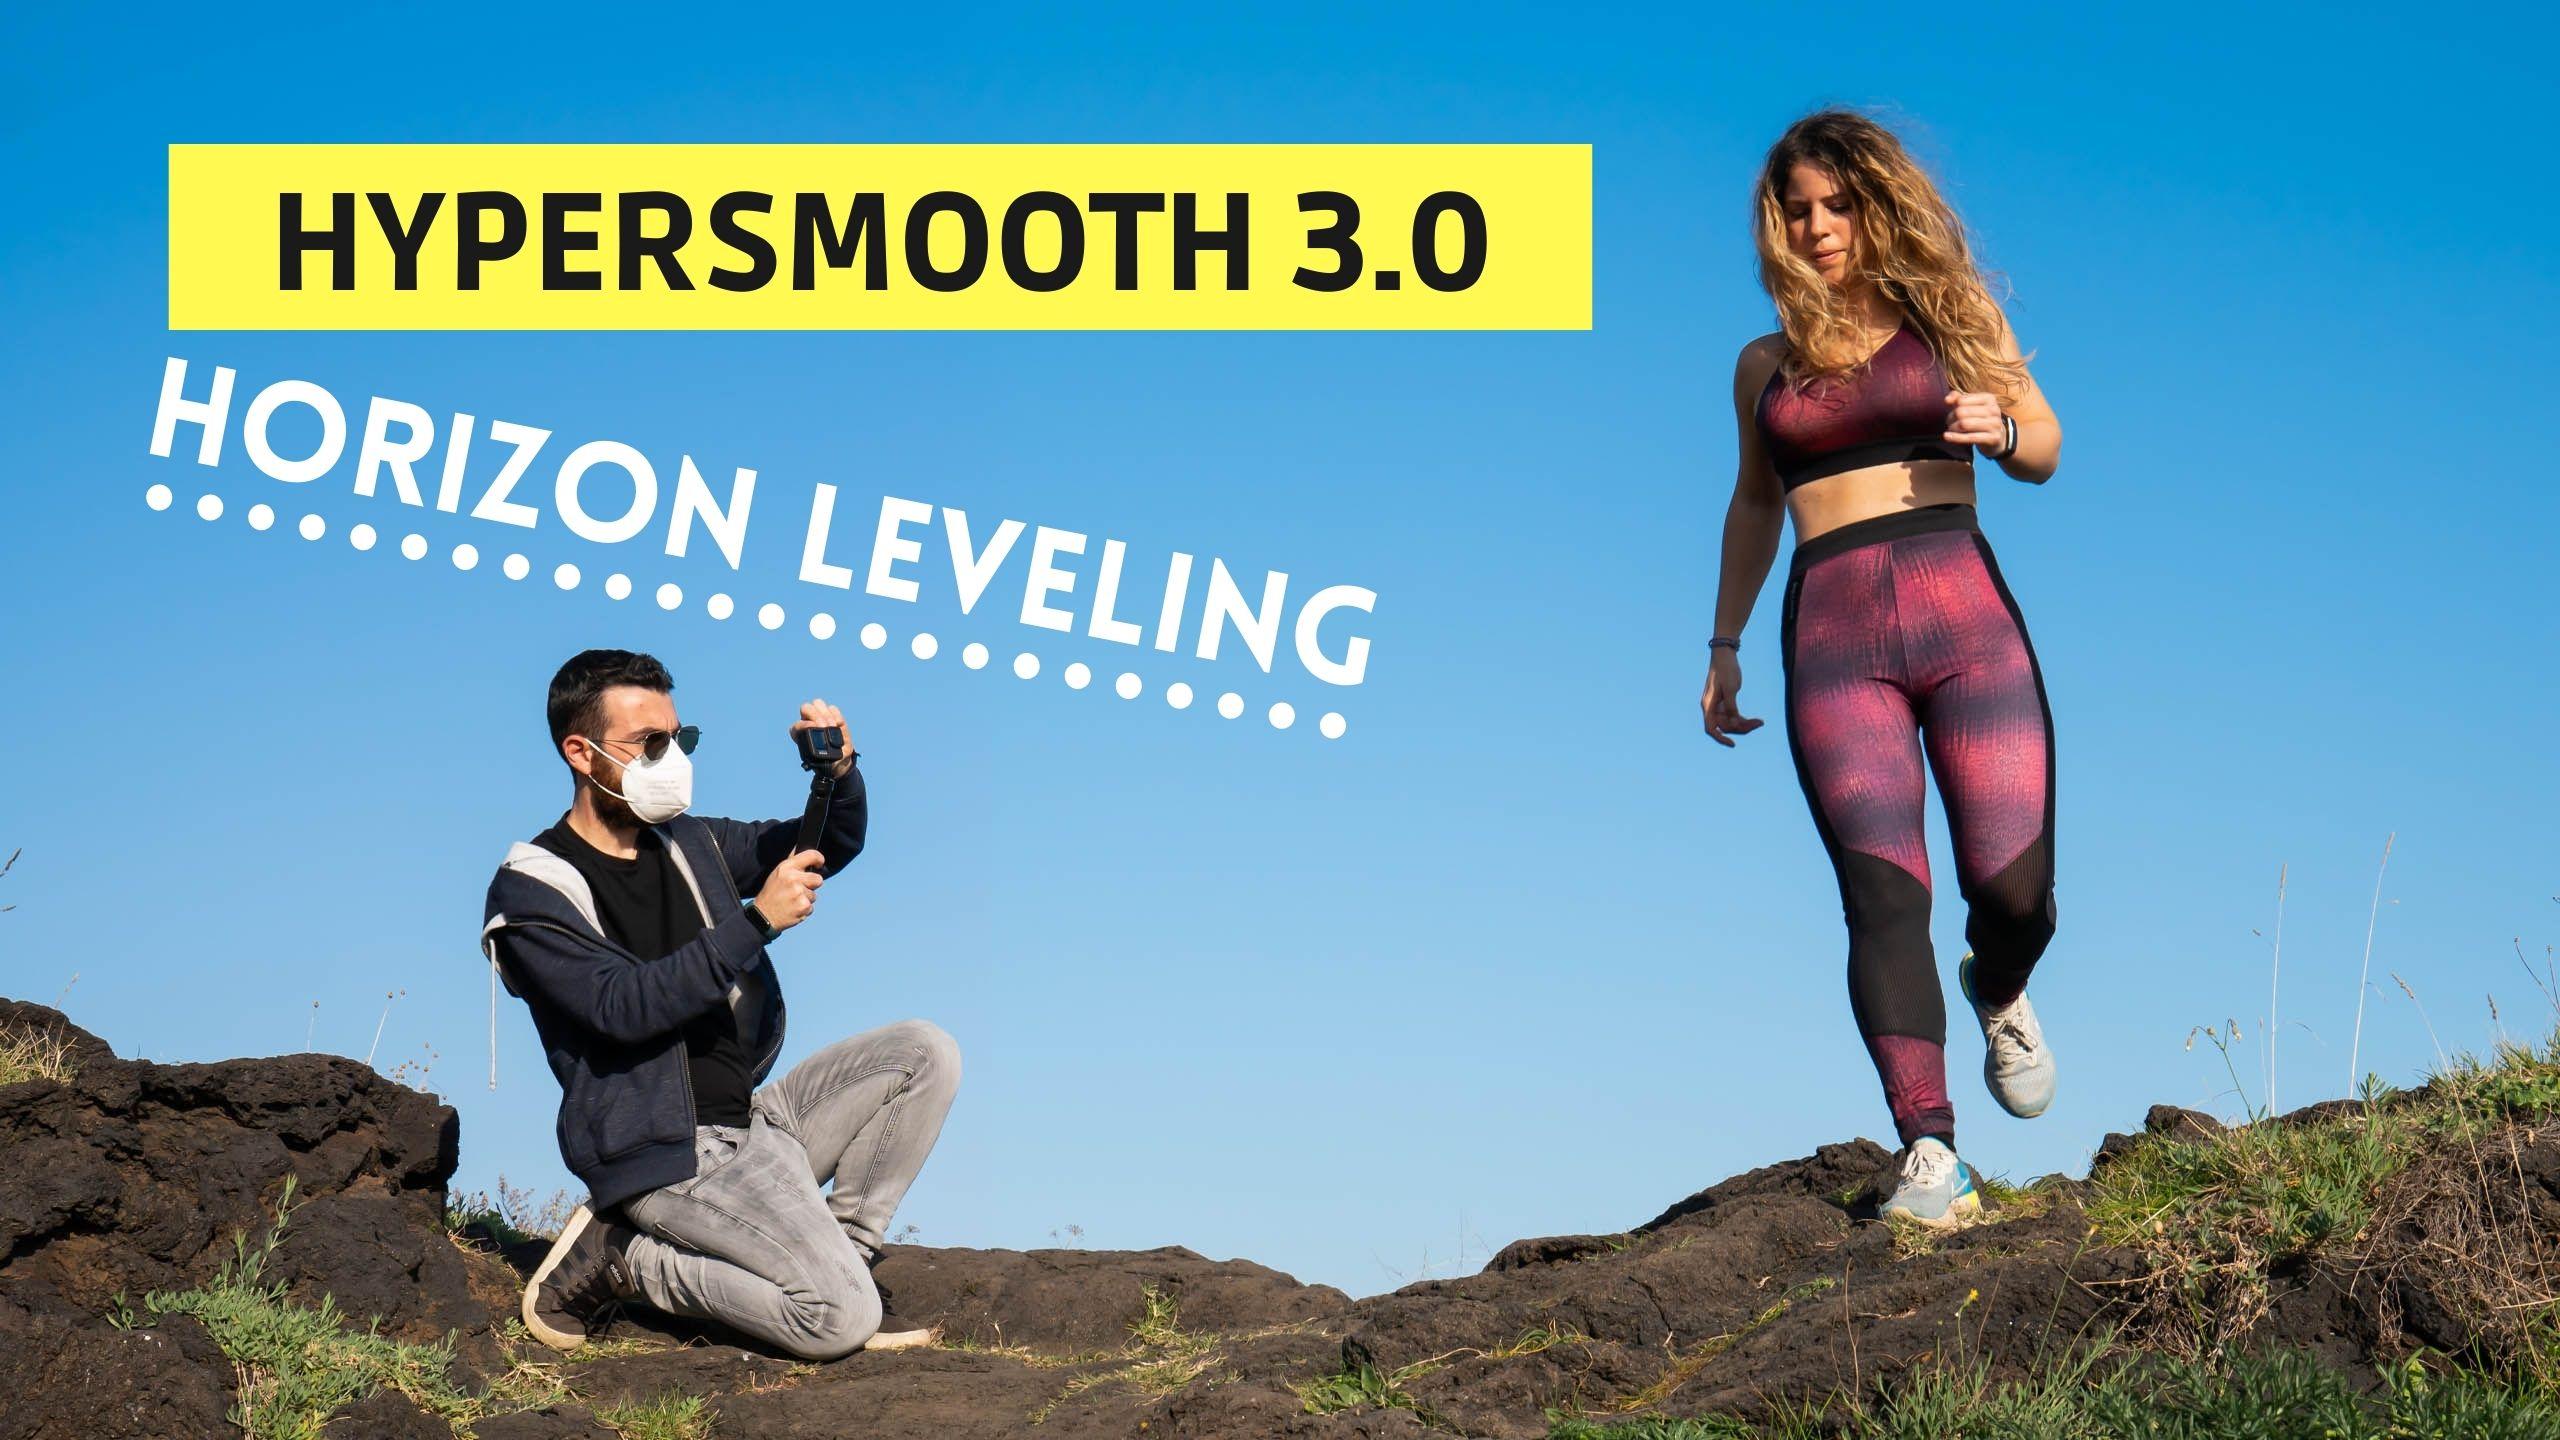 GoPro hypersmooth horizon leveling